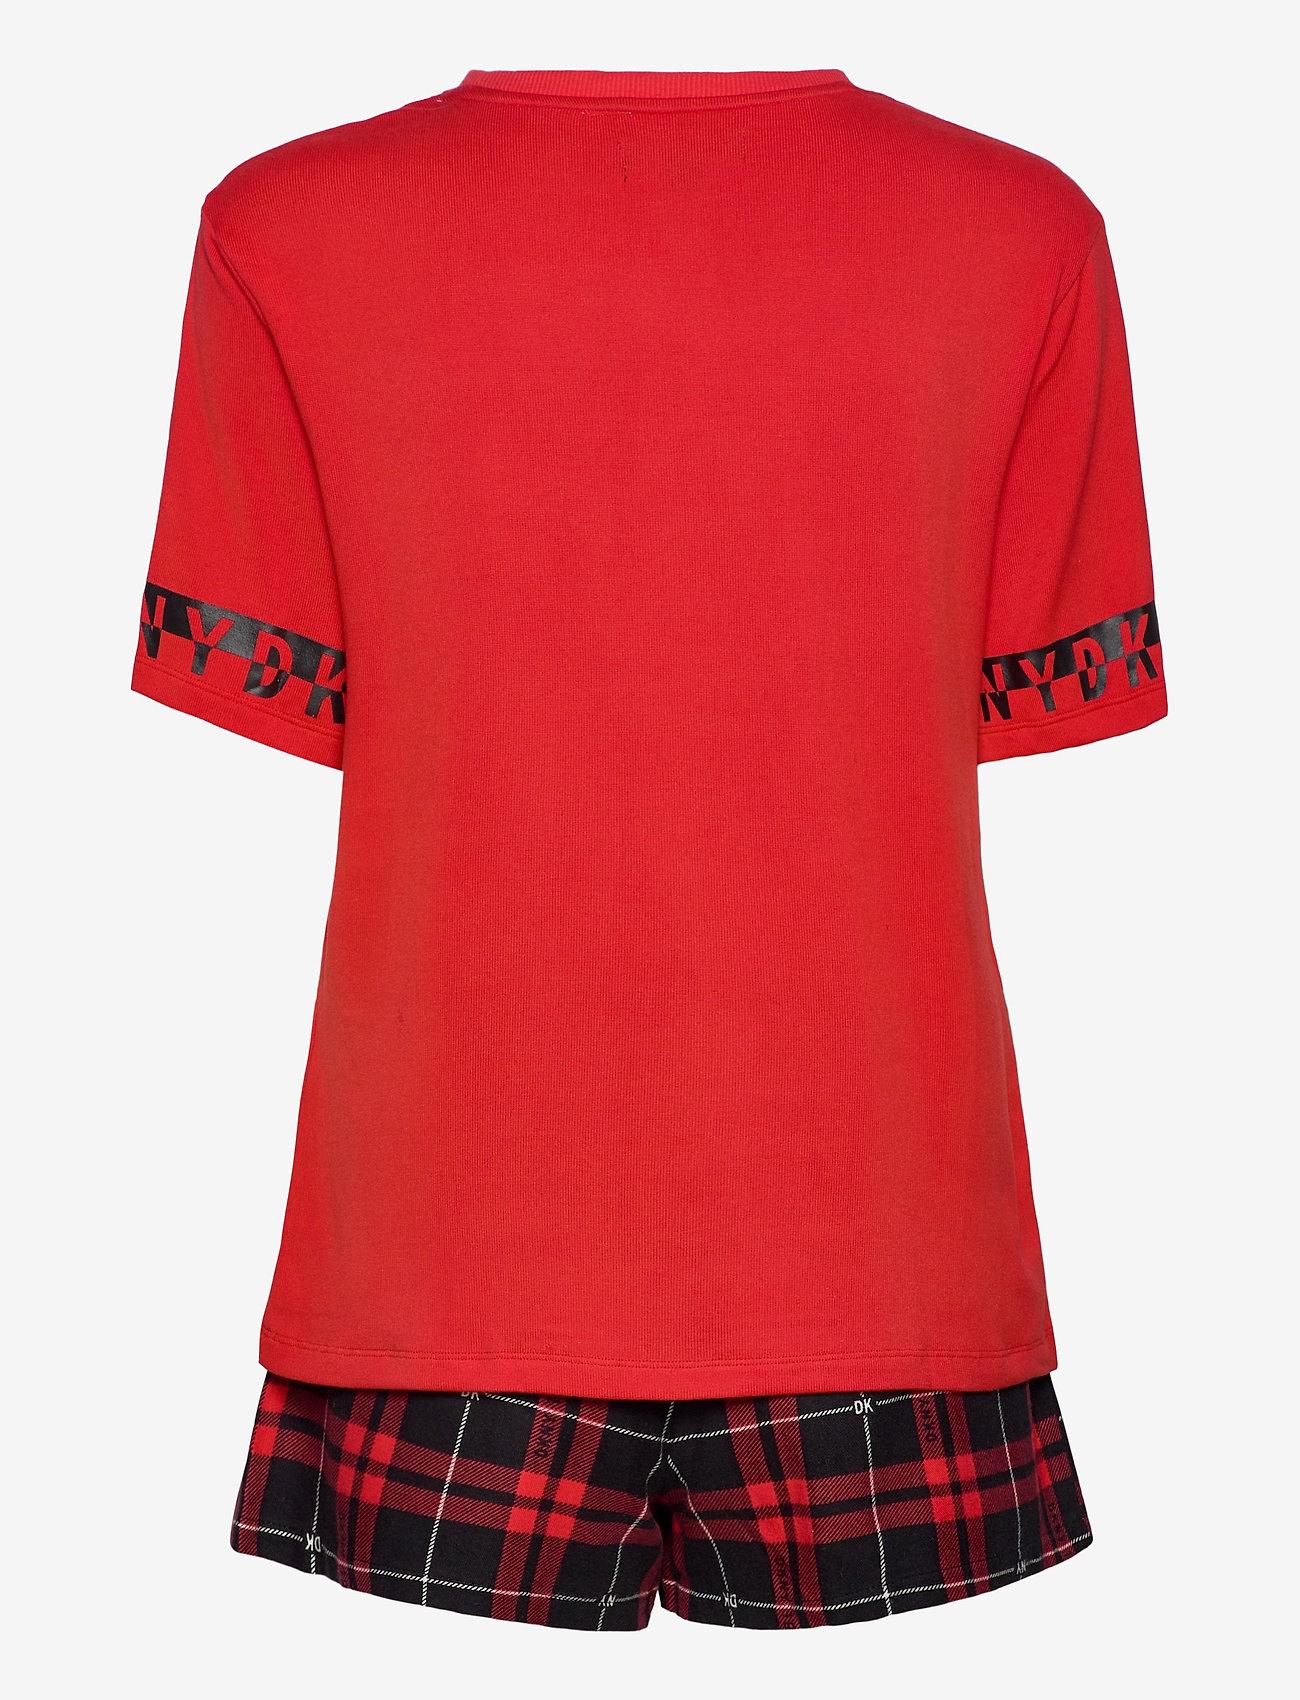 DKNY Homewear - DKNY 100% DKNY TOP, BOXER & EYEMASK BOX - pyjama''s - ruby check - 1